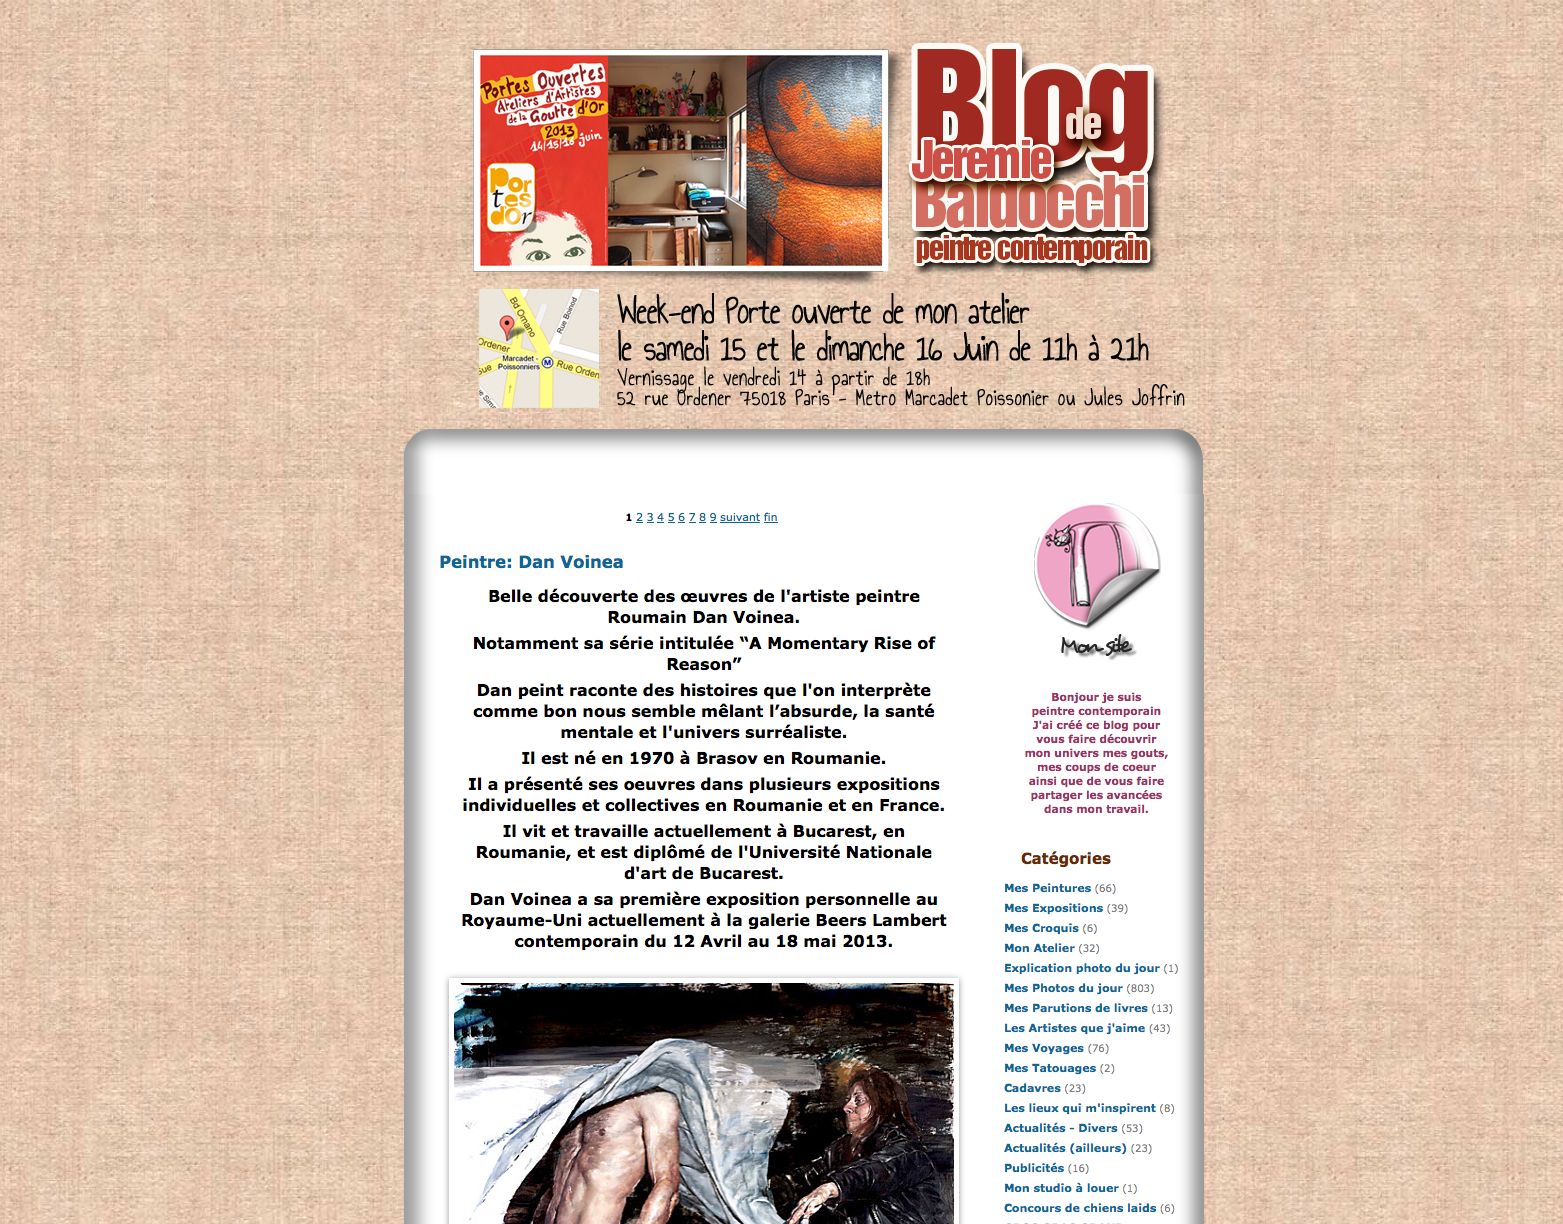 visuel précédente version de mon blog